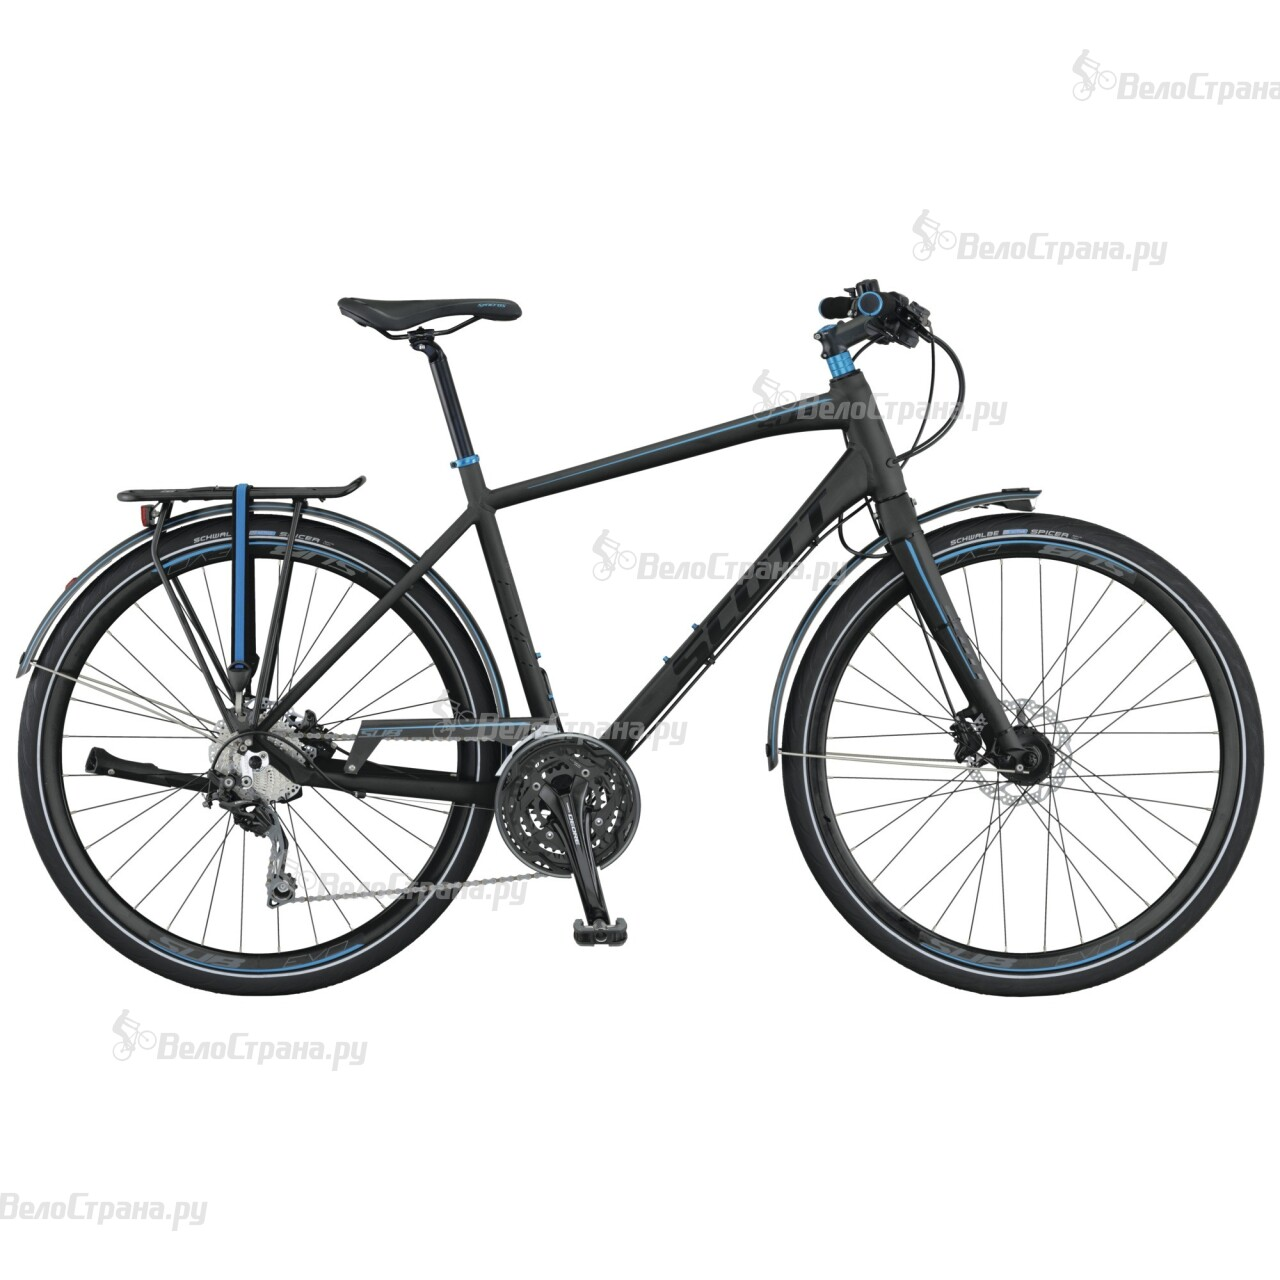 Велосипед Scott Sub Evo 30 (2015) free ship gt1752s 452204 452204 0004 9172123 55560913 turbo turbine for saab 9 3 9 5 2 0t 2 3t b235e b205e b205l 2 0lpt 2 3lpt